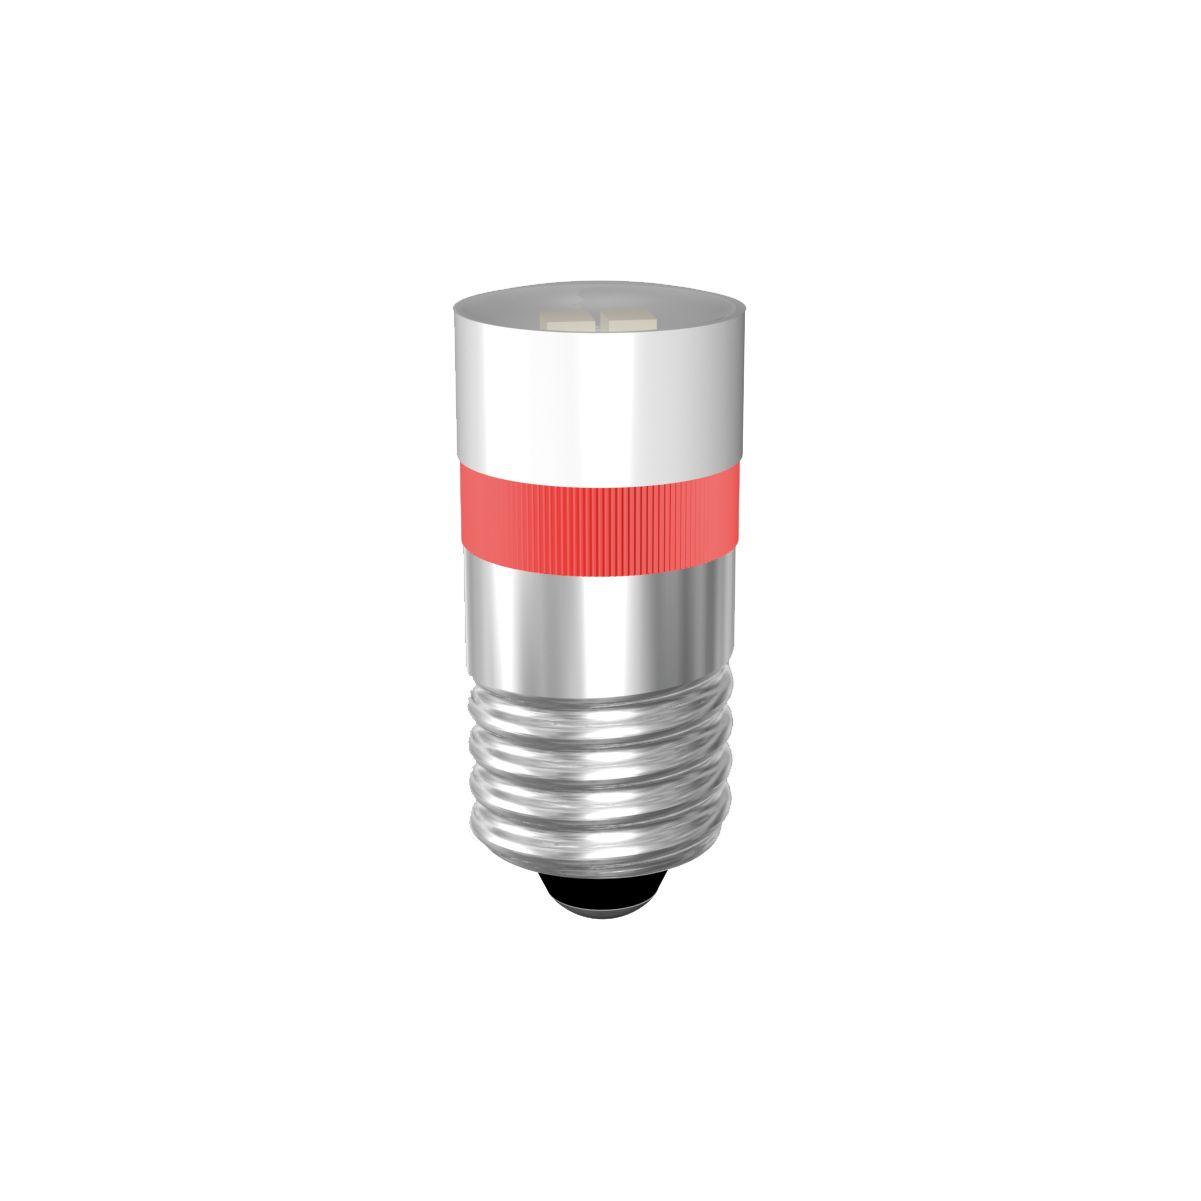 Multi-Look® LED lamp socket E10